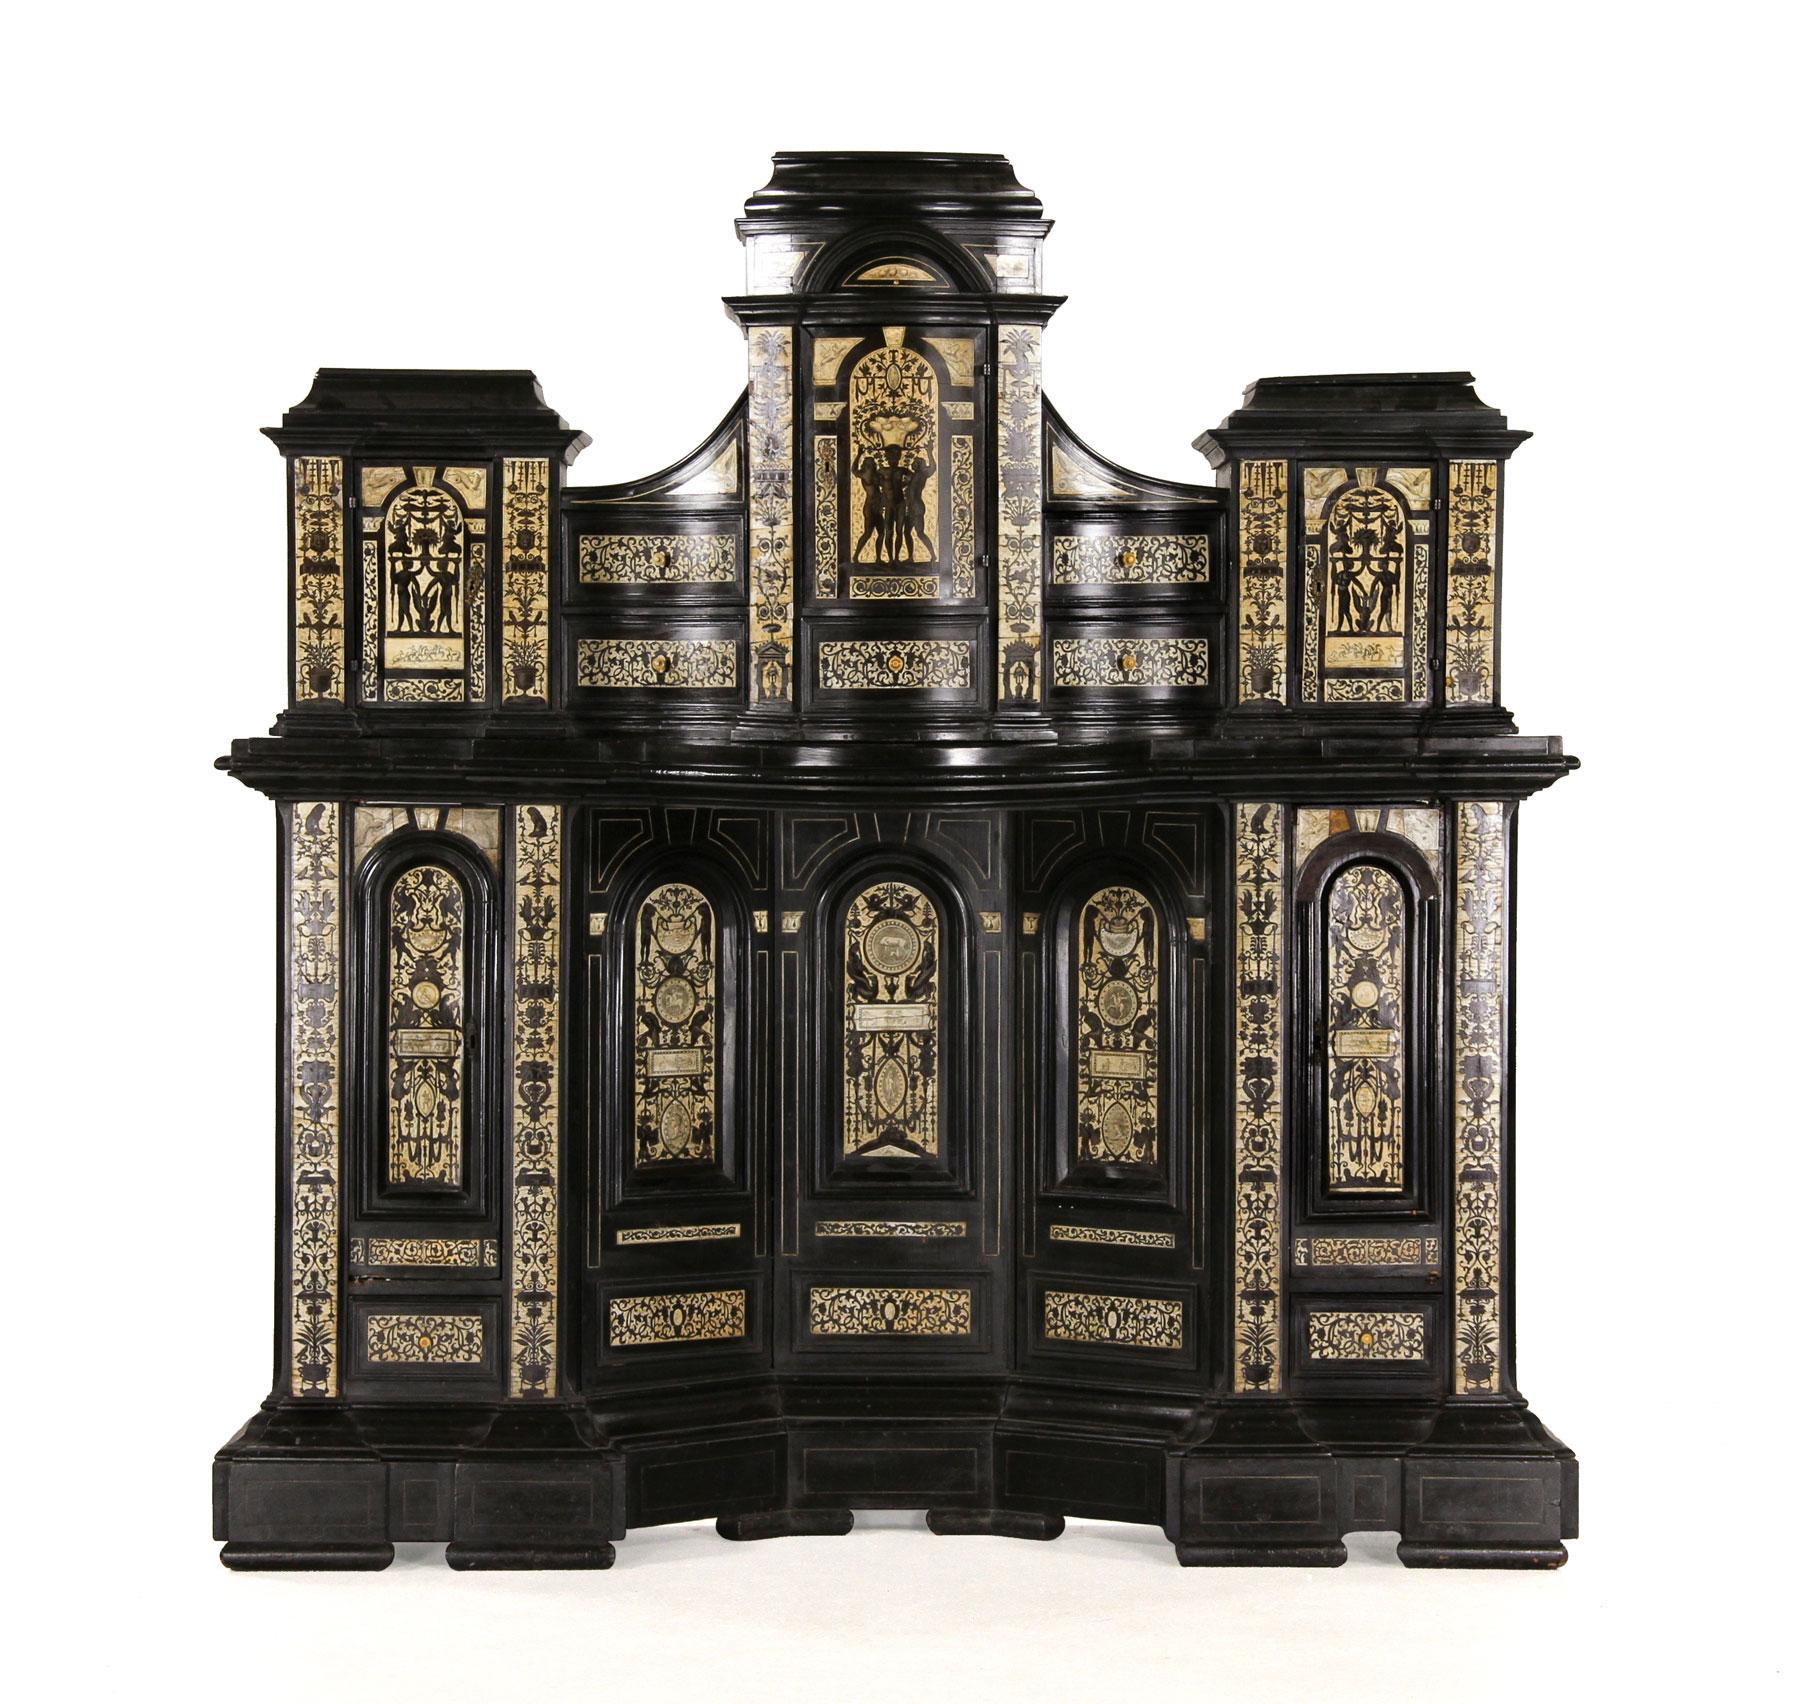 Italian Renaissance Revival Ebonized Cabinet, 18th/19th Century. Kaminski  Auctions Image